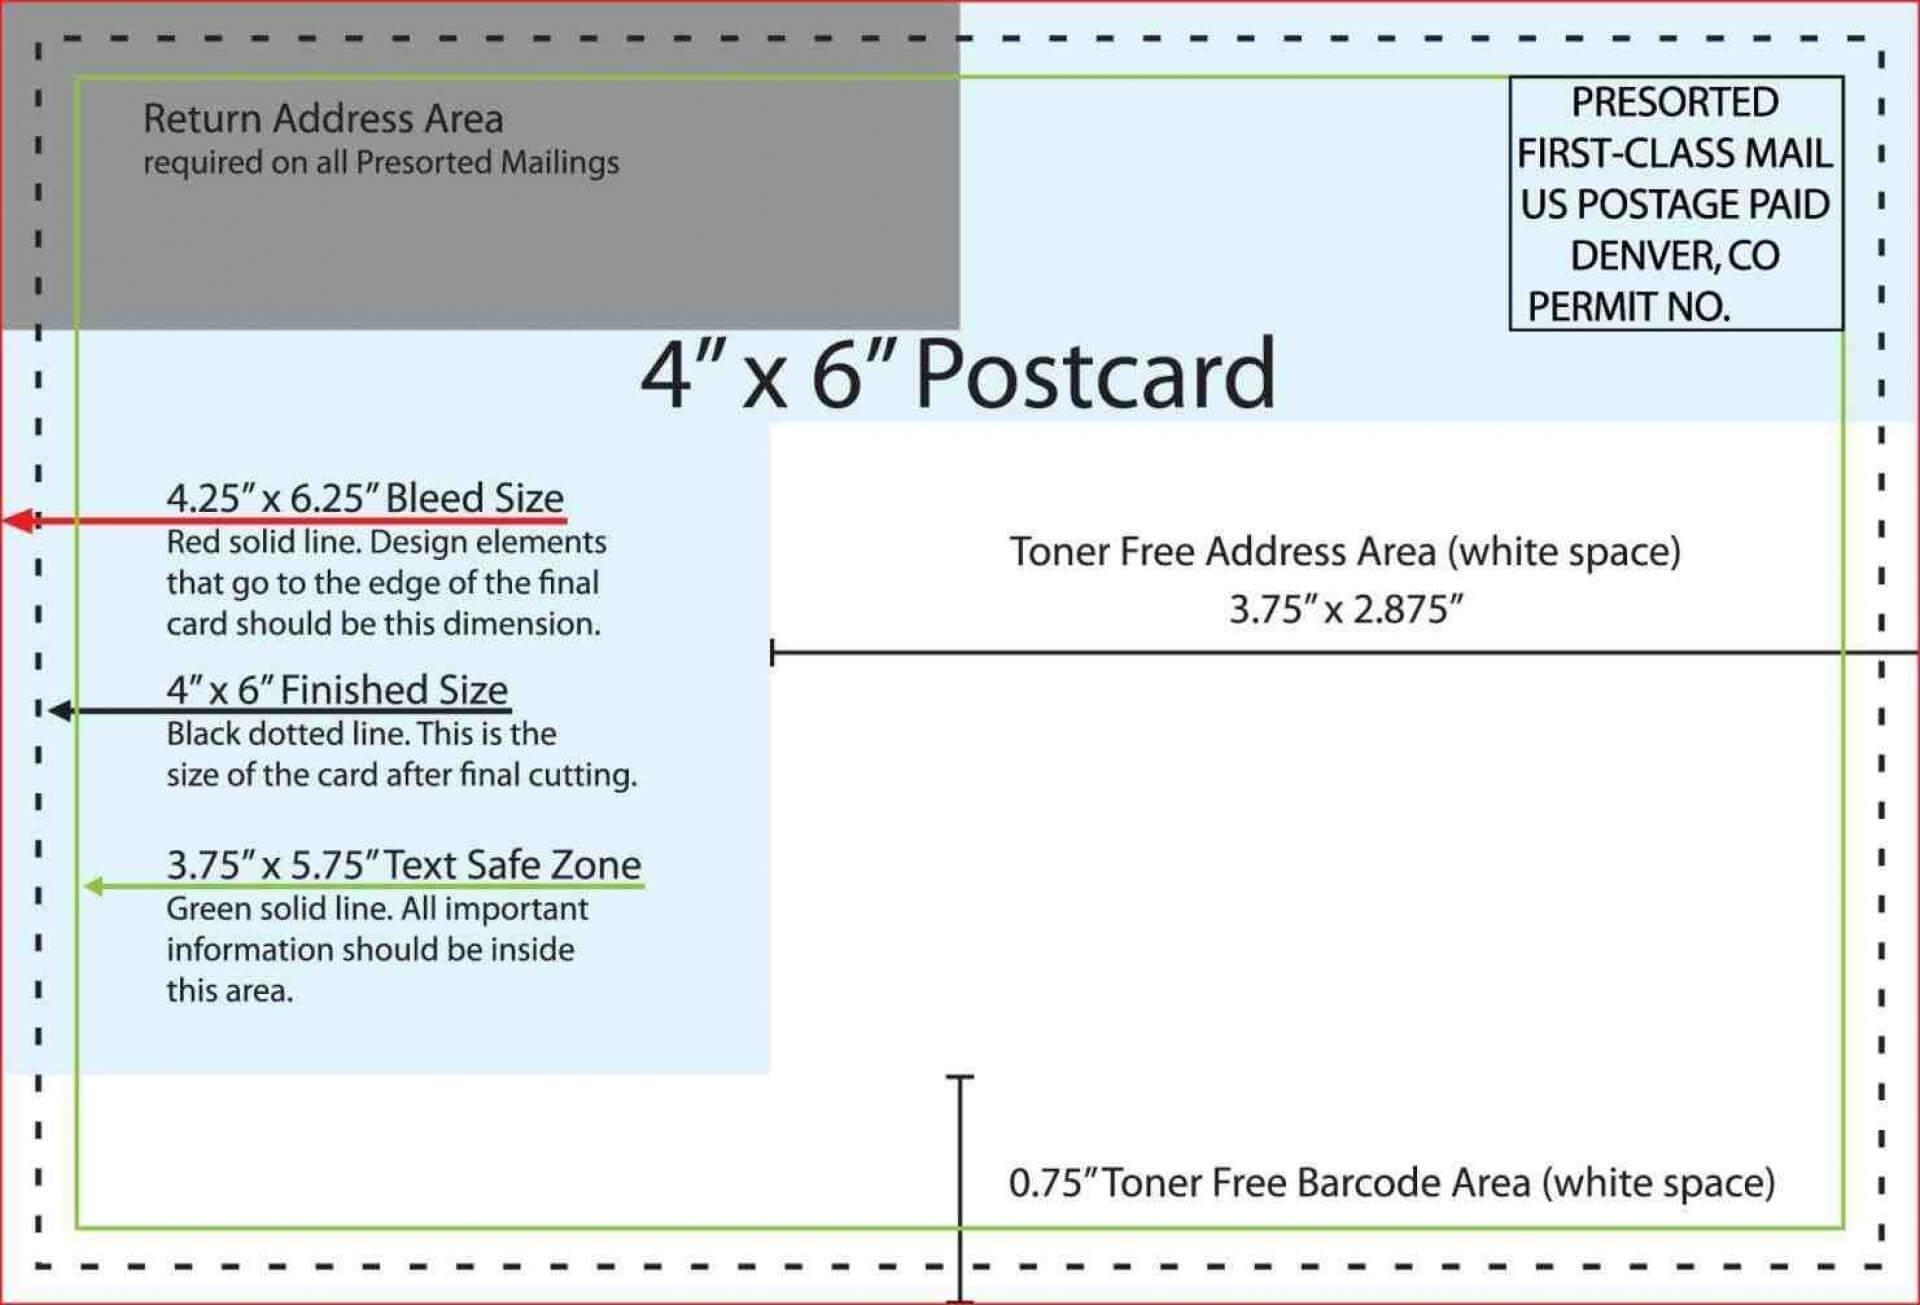 001 Template Ideas X Templates 4X6 Card Resume Postcard Regarding Microsoft Word 4X6 Postcard Template